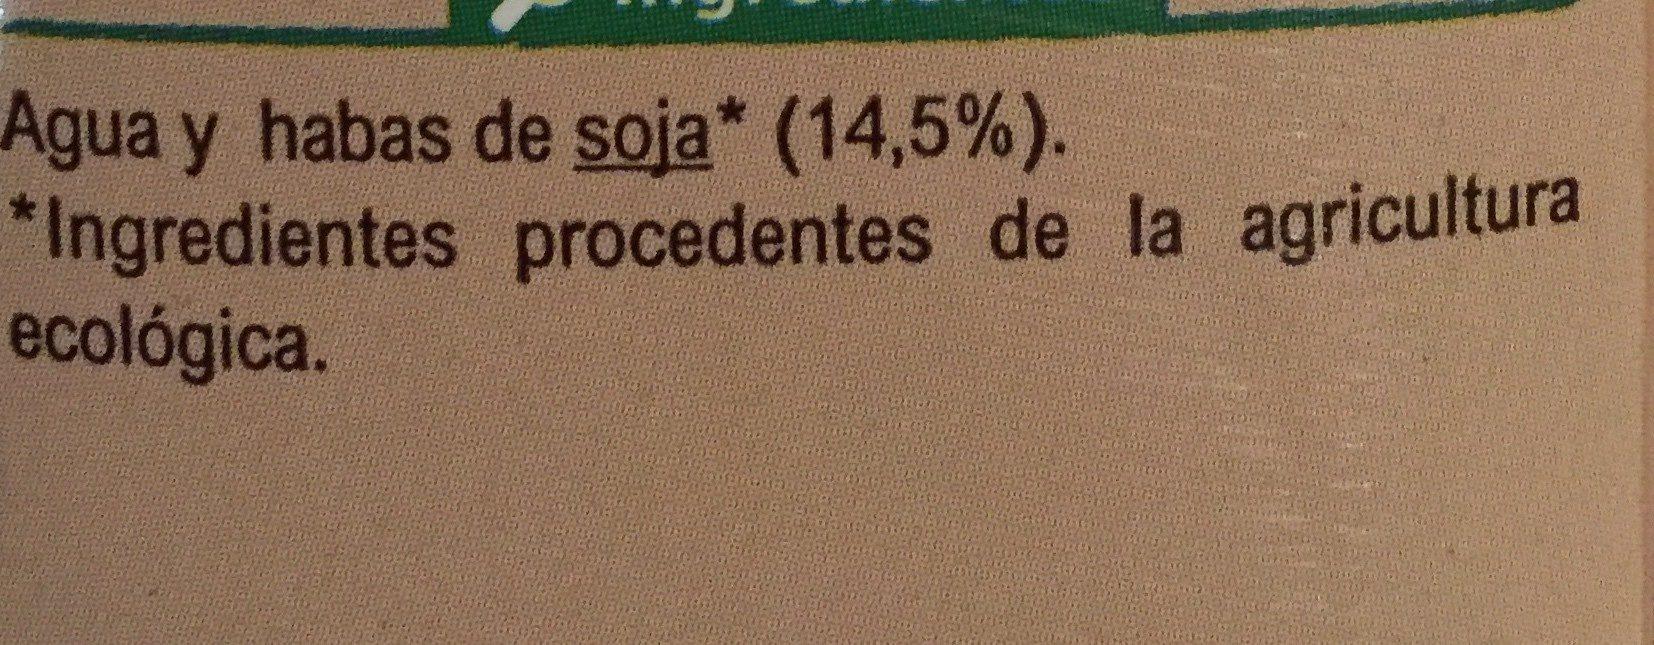 Bebida soja classic - Ingrédients - fr